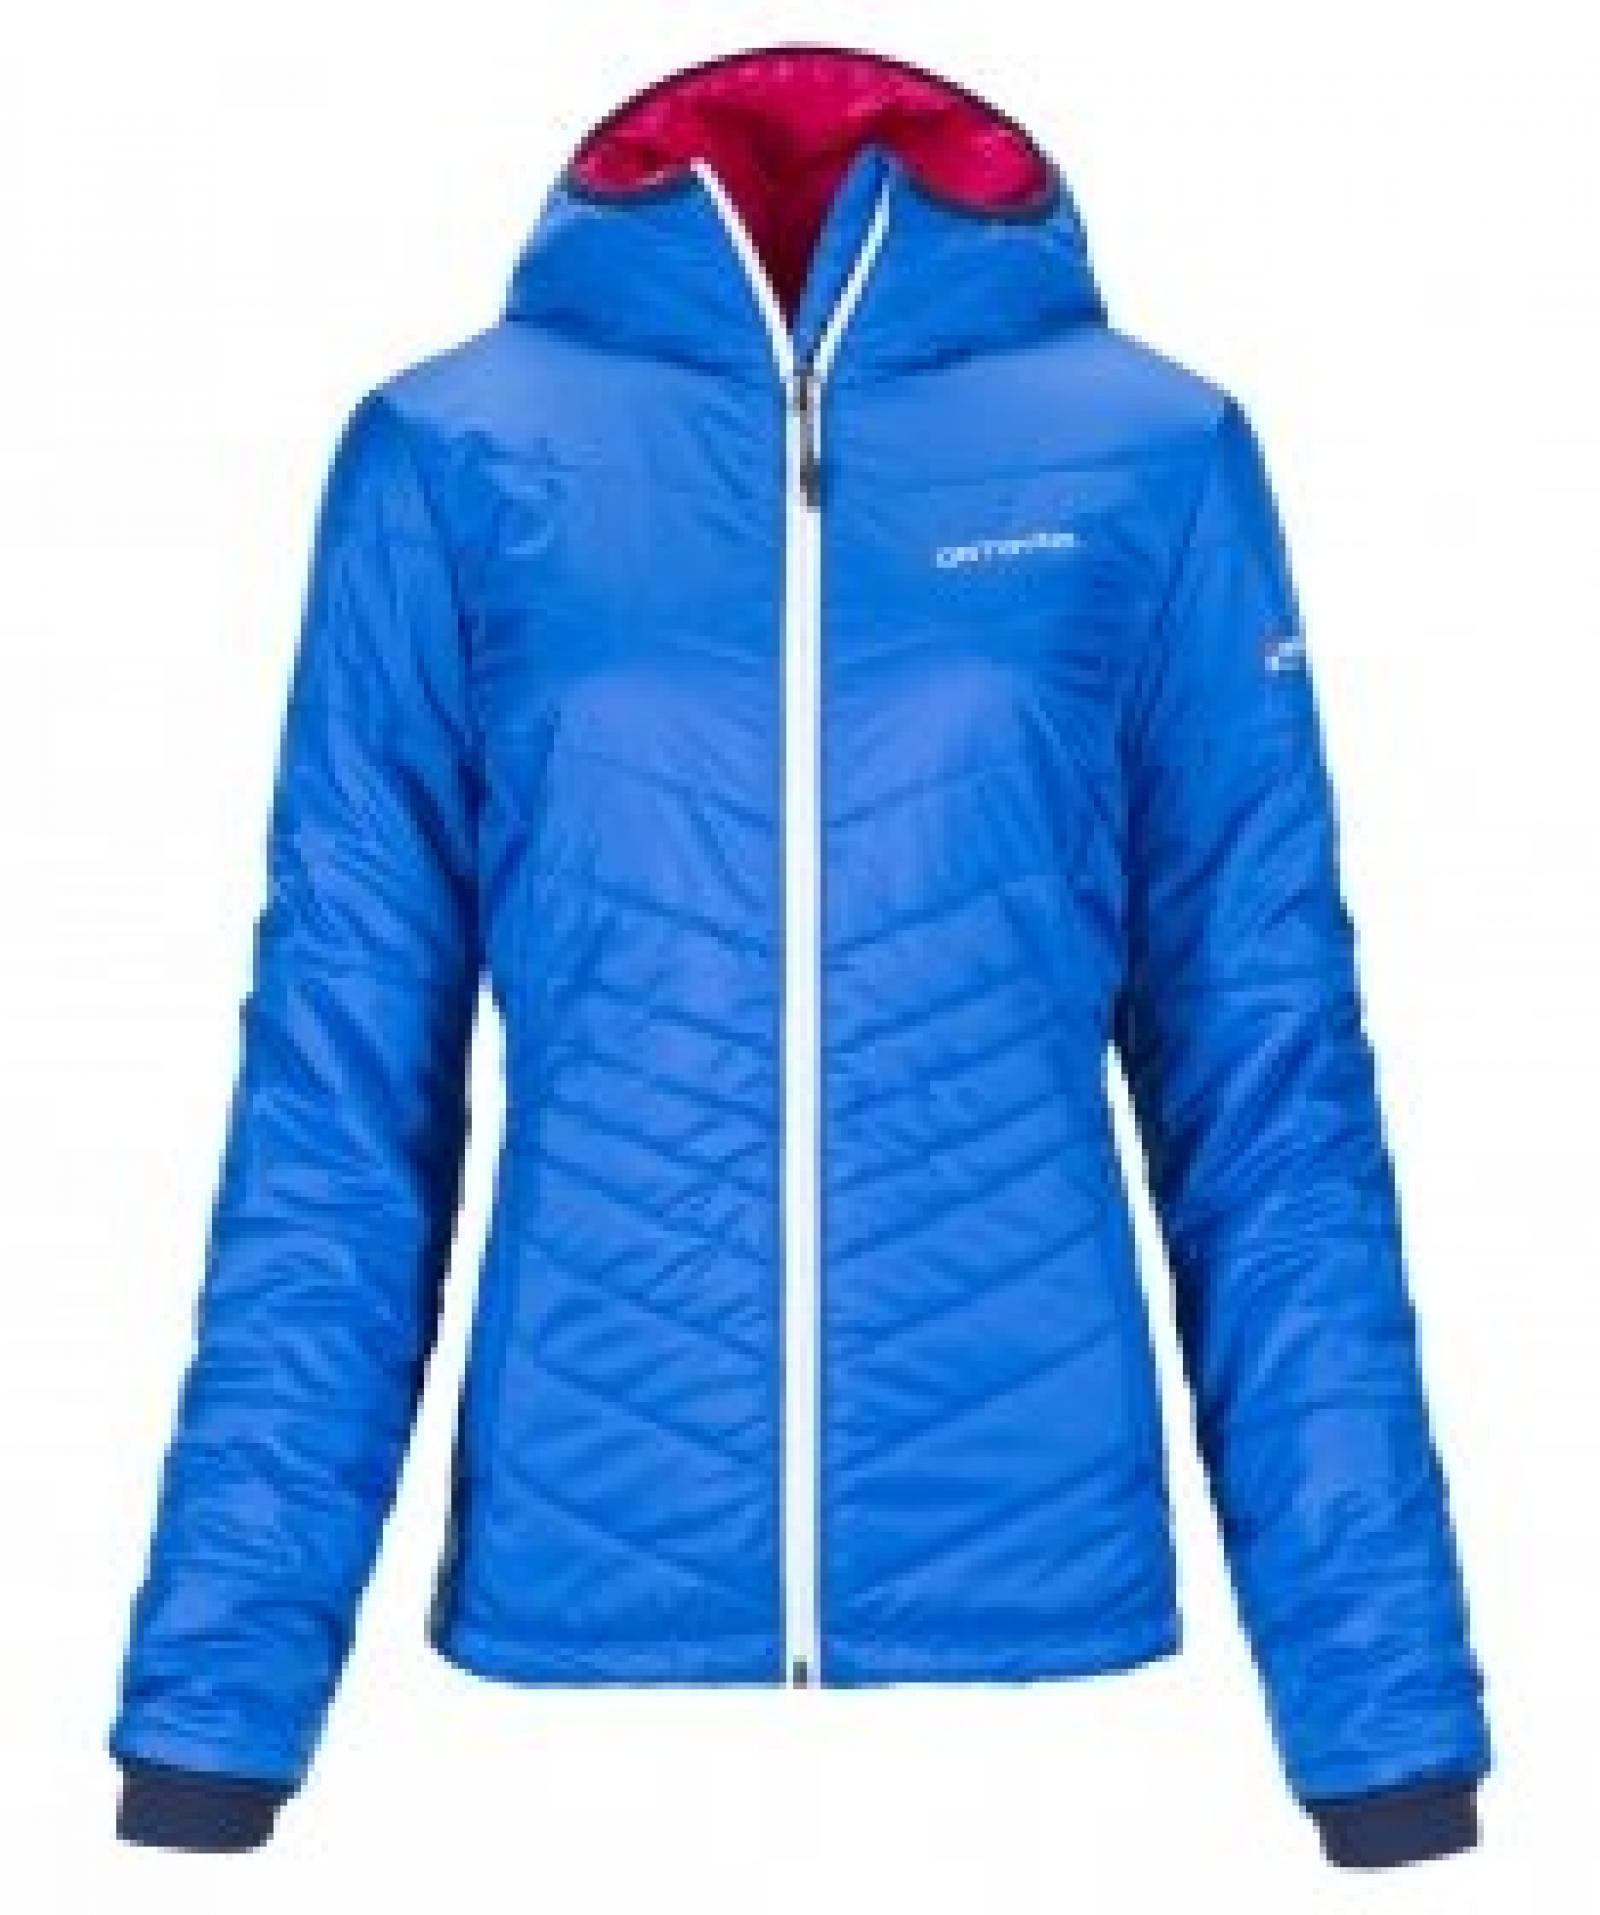 Ortovox Jacket Piz Bernina W blau